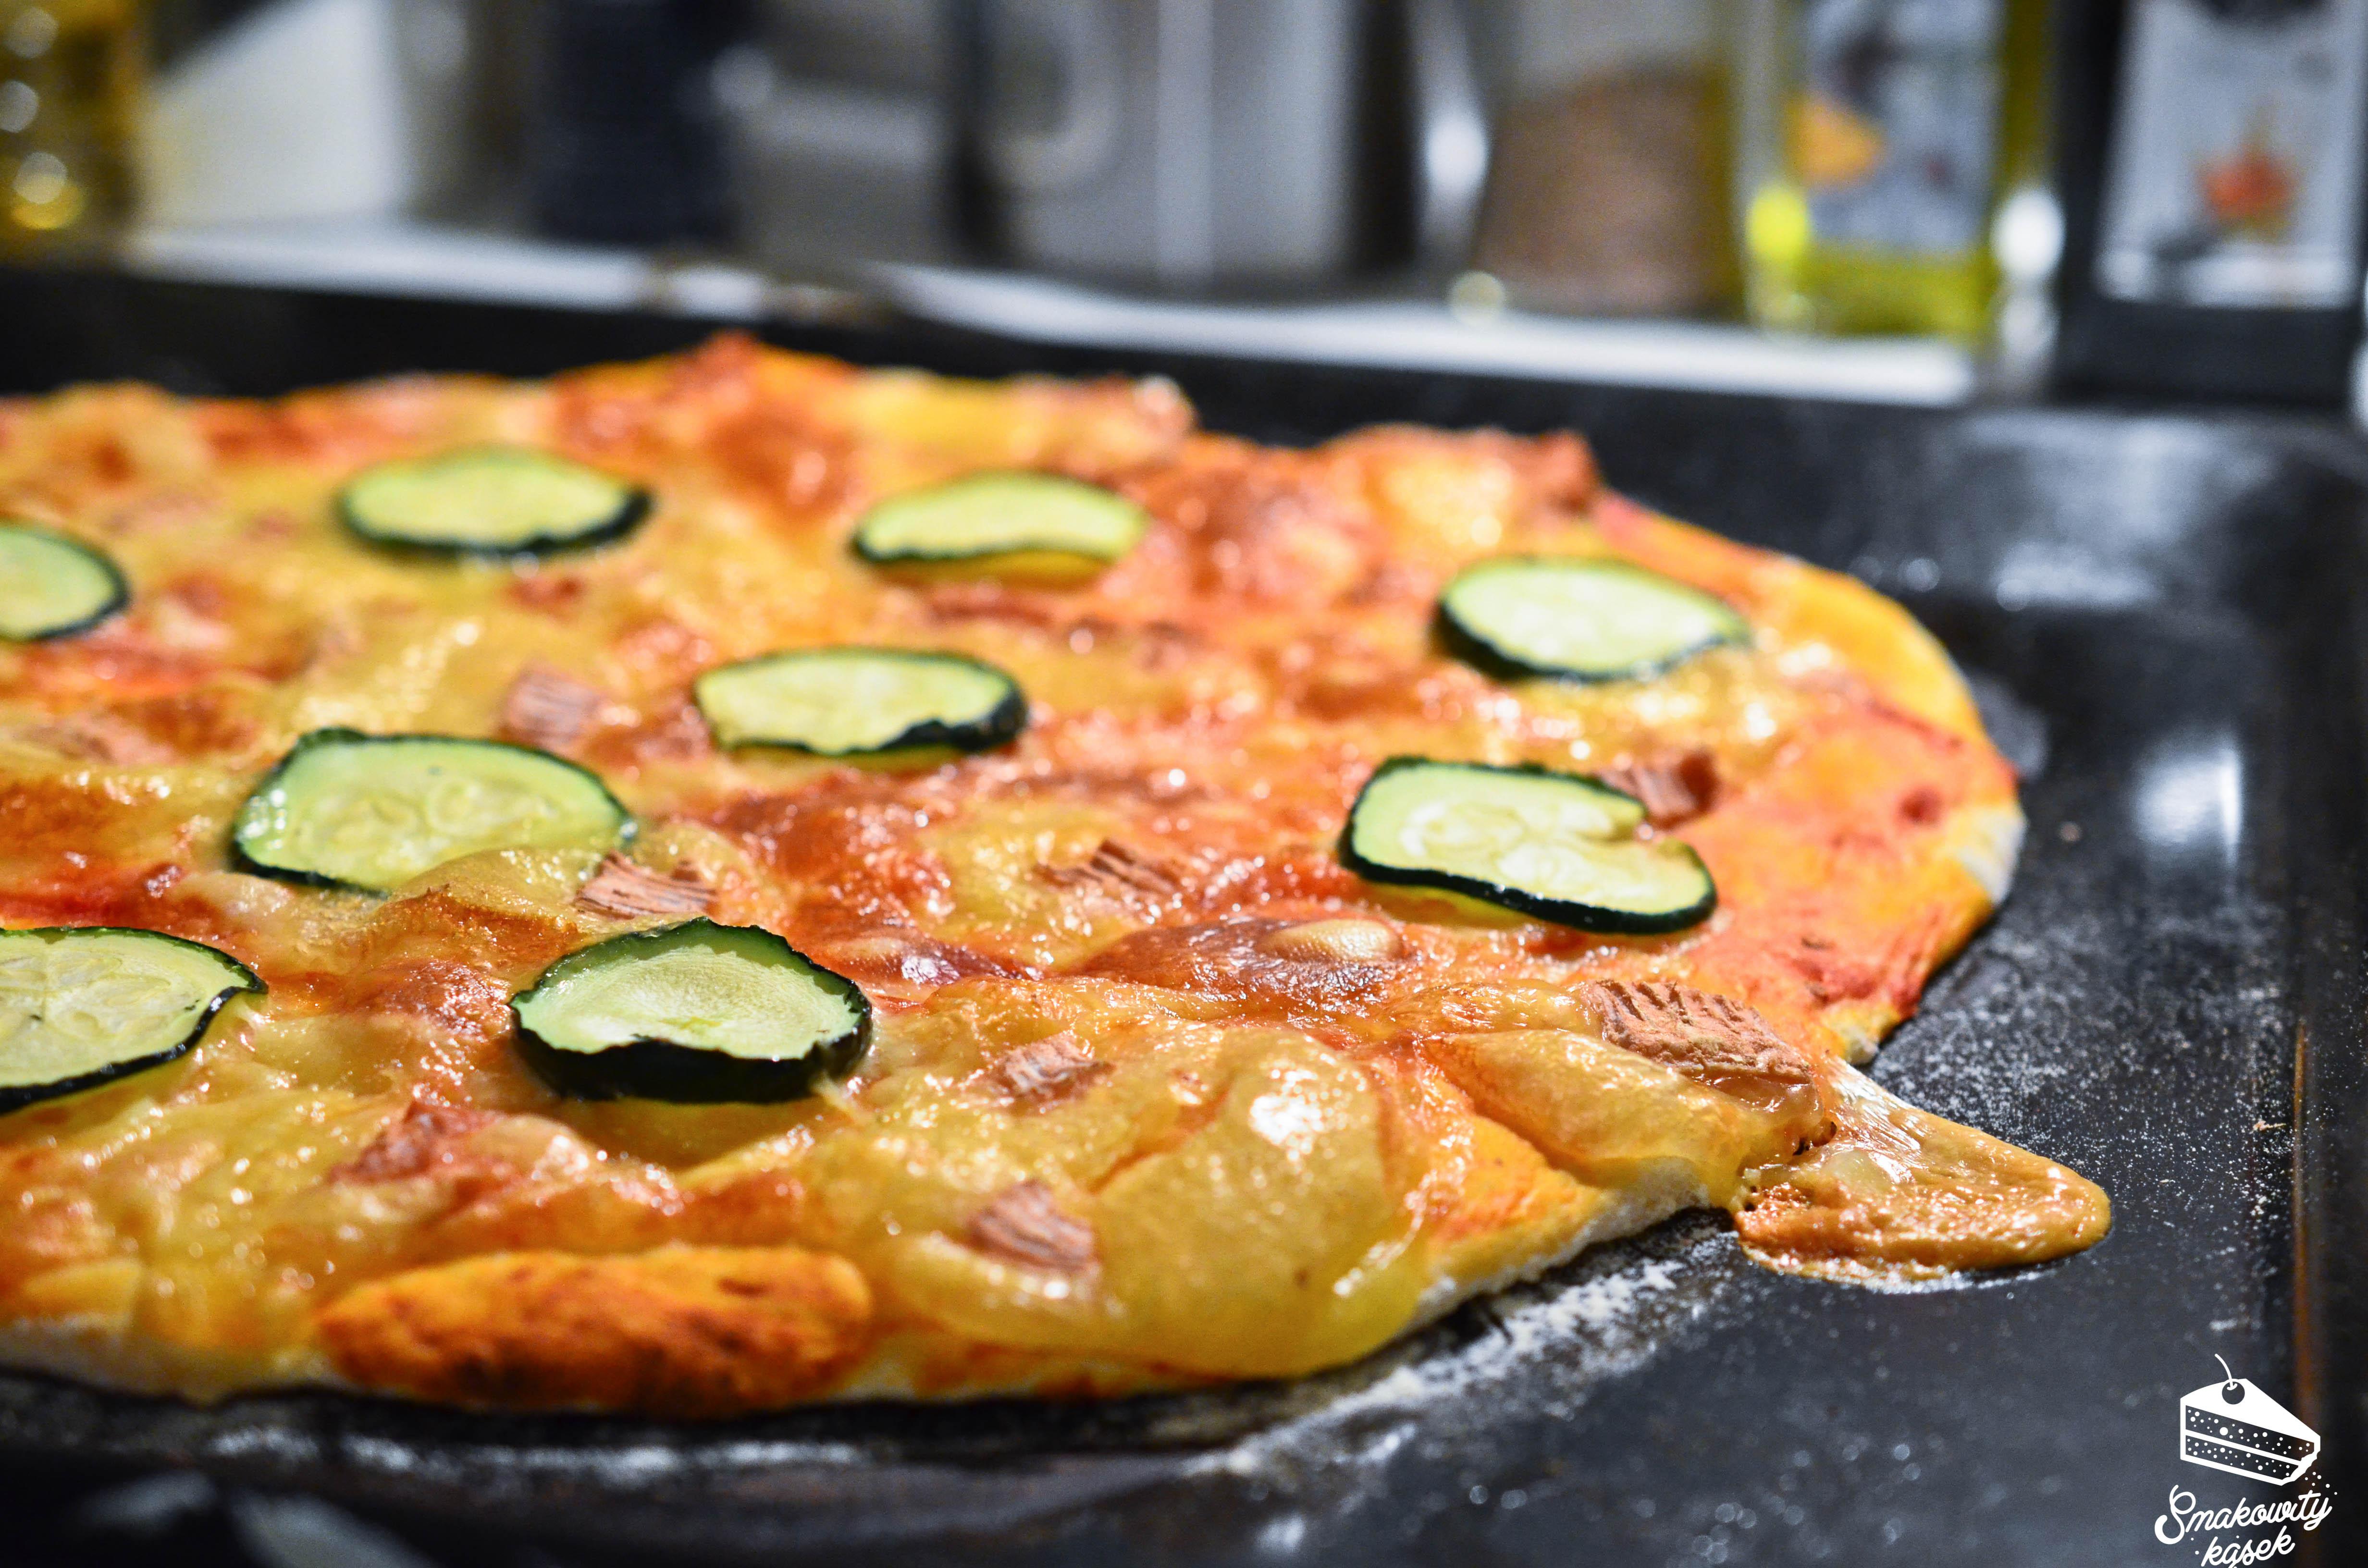 domowa pizza (1 of 1)